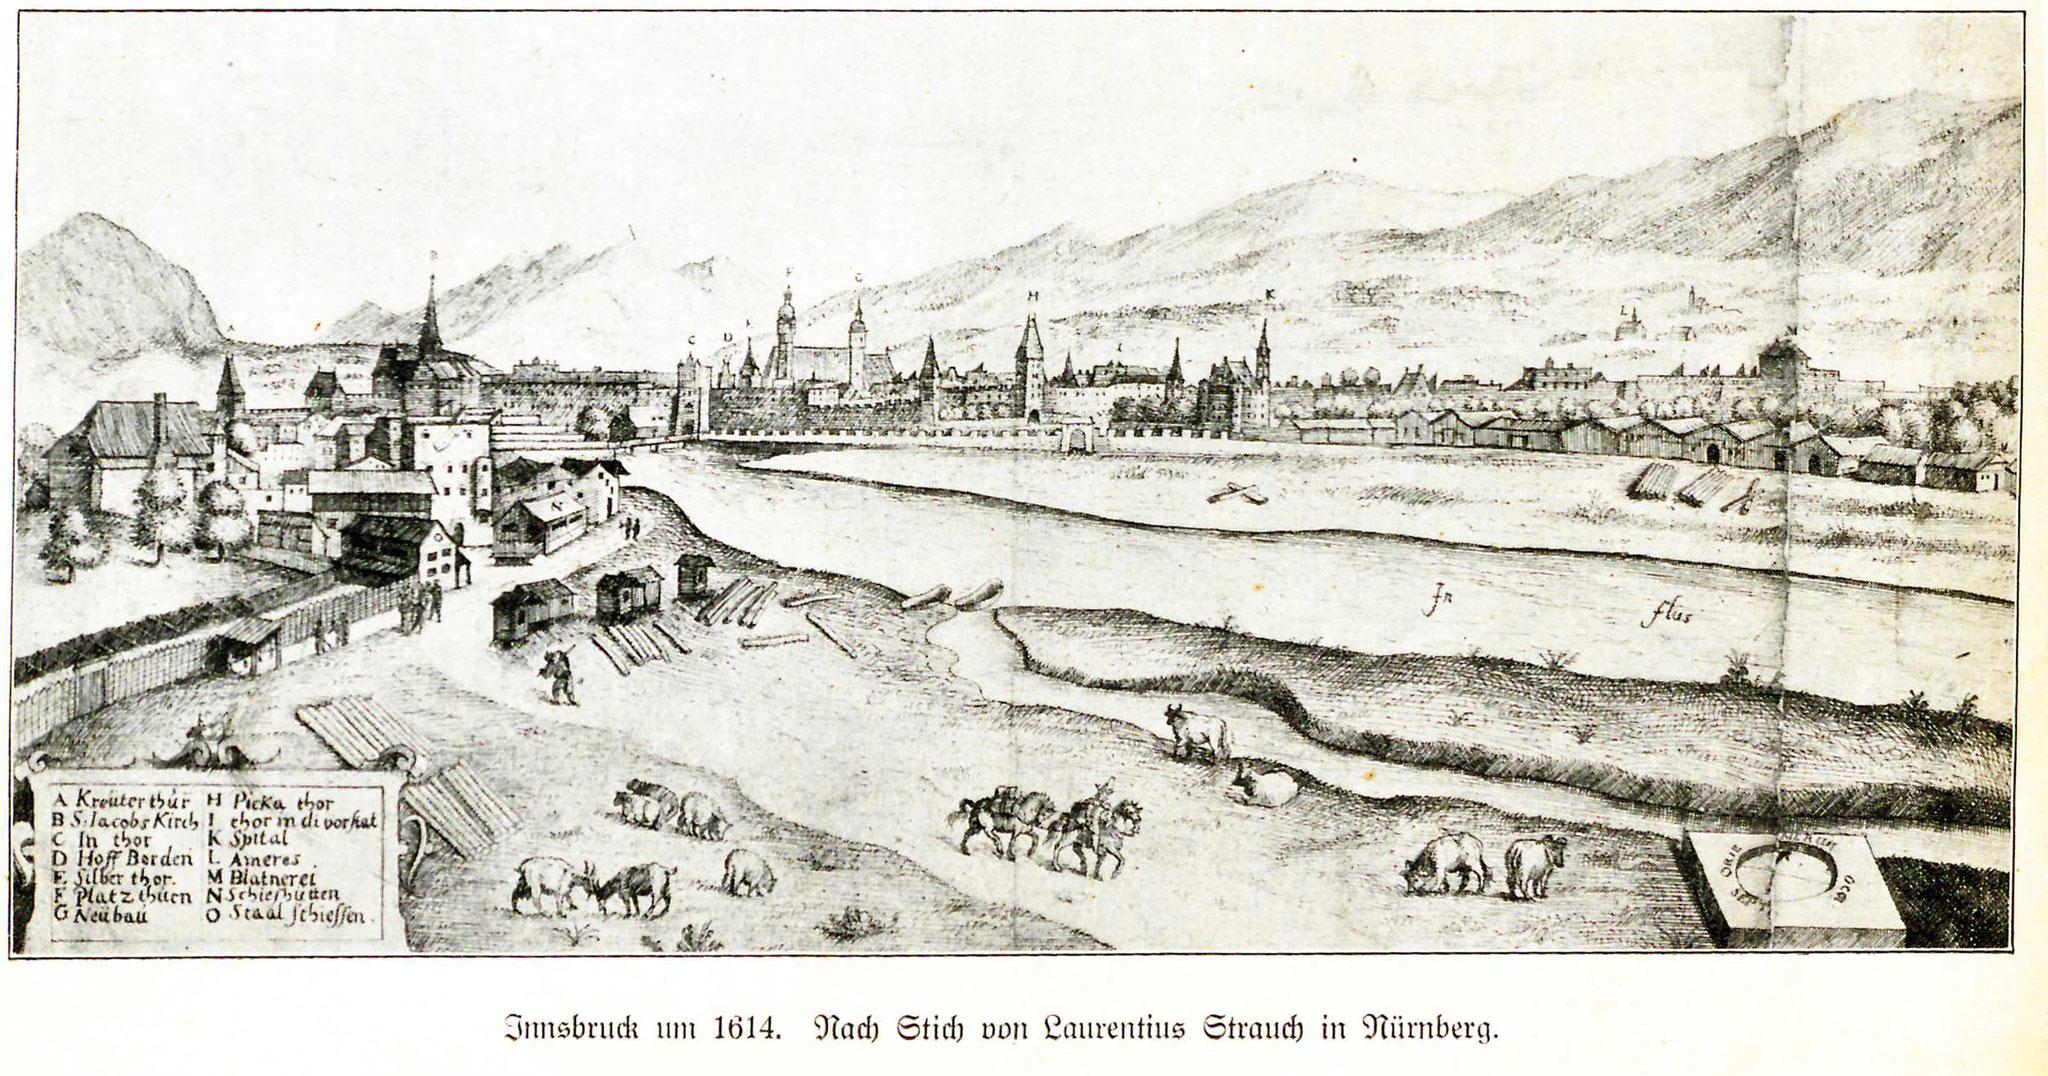 Innsbruck 1614